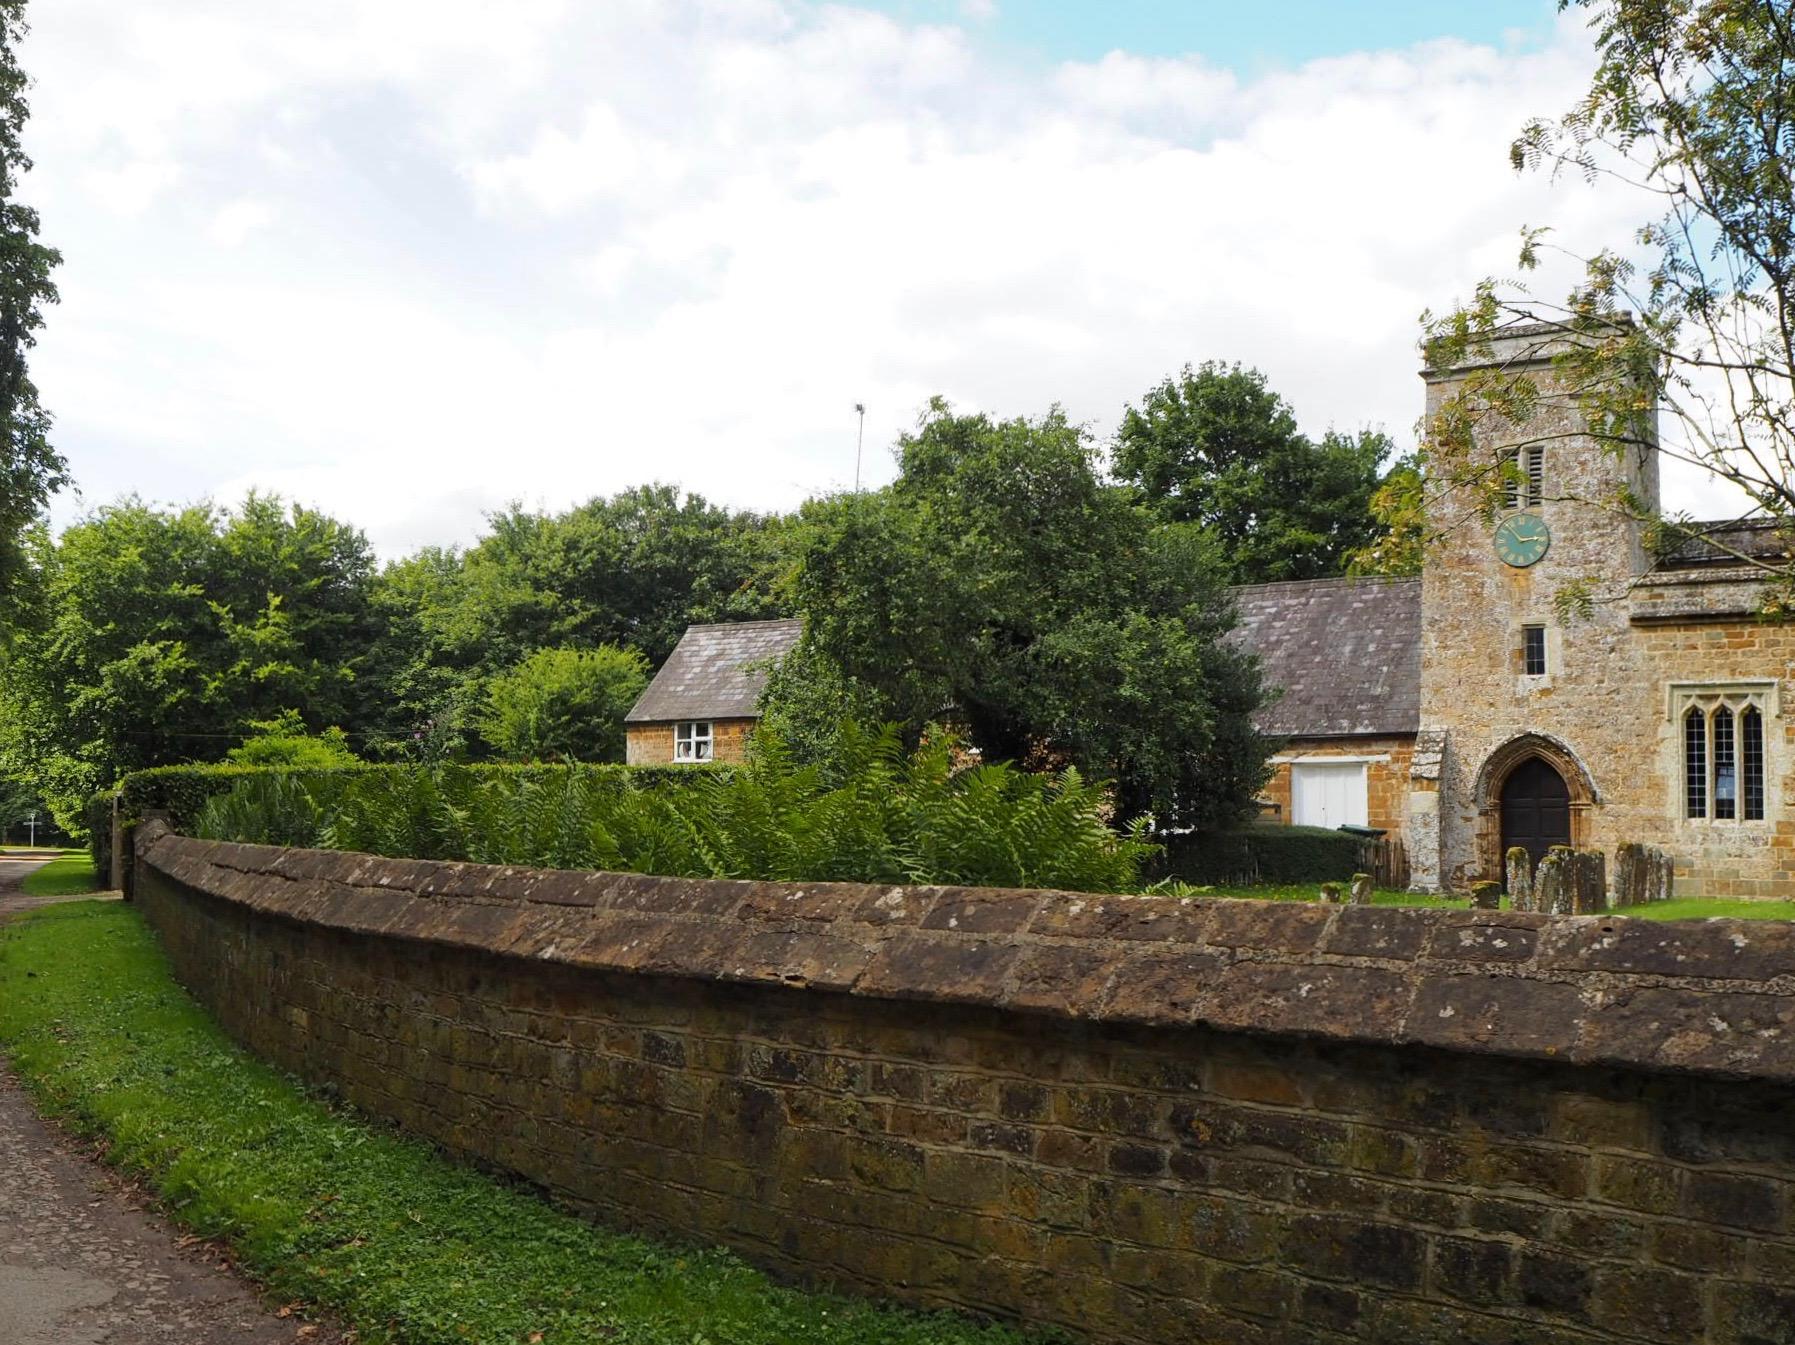 The small parish church in Nether Worton